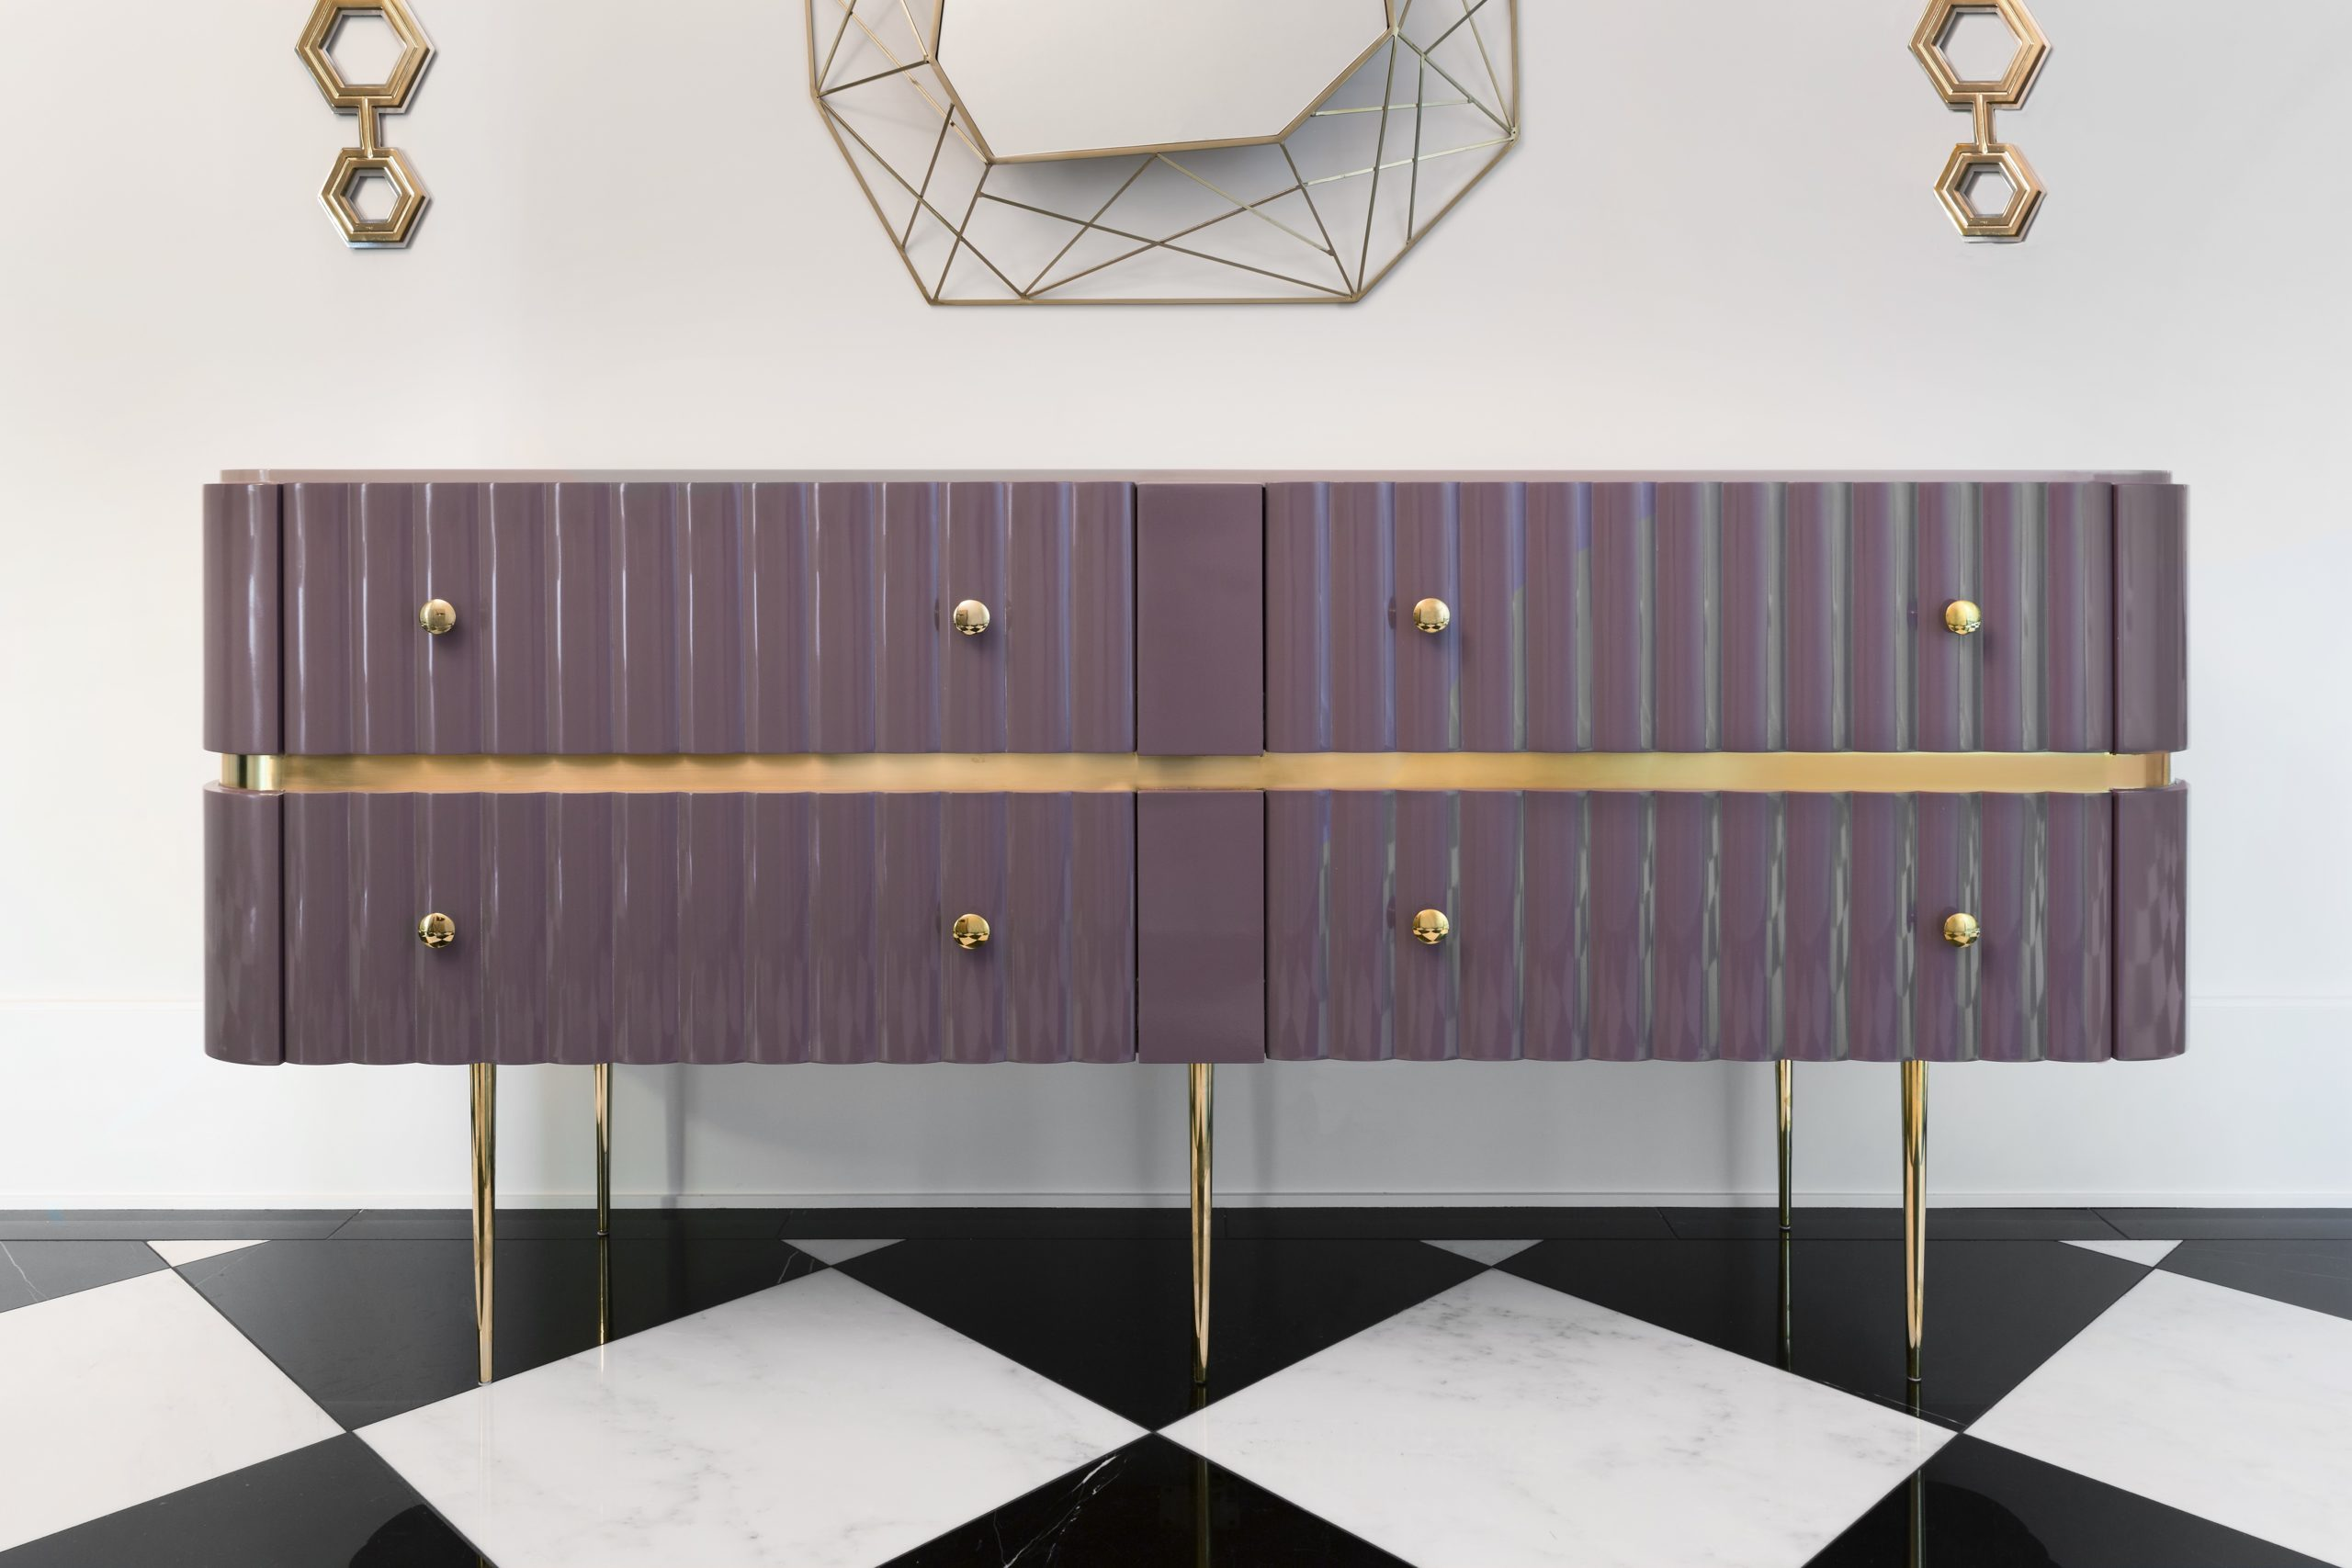 Studio_William_Hefner_products_contessa_console_Fremont_31__Hall_Table_2